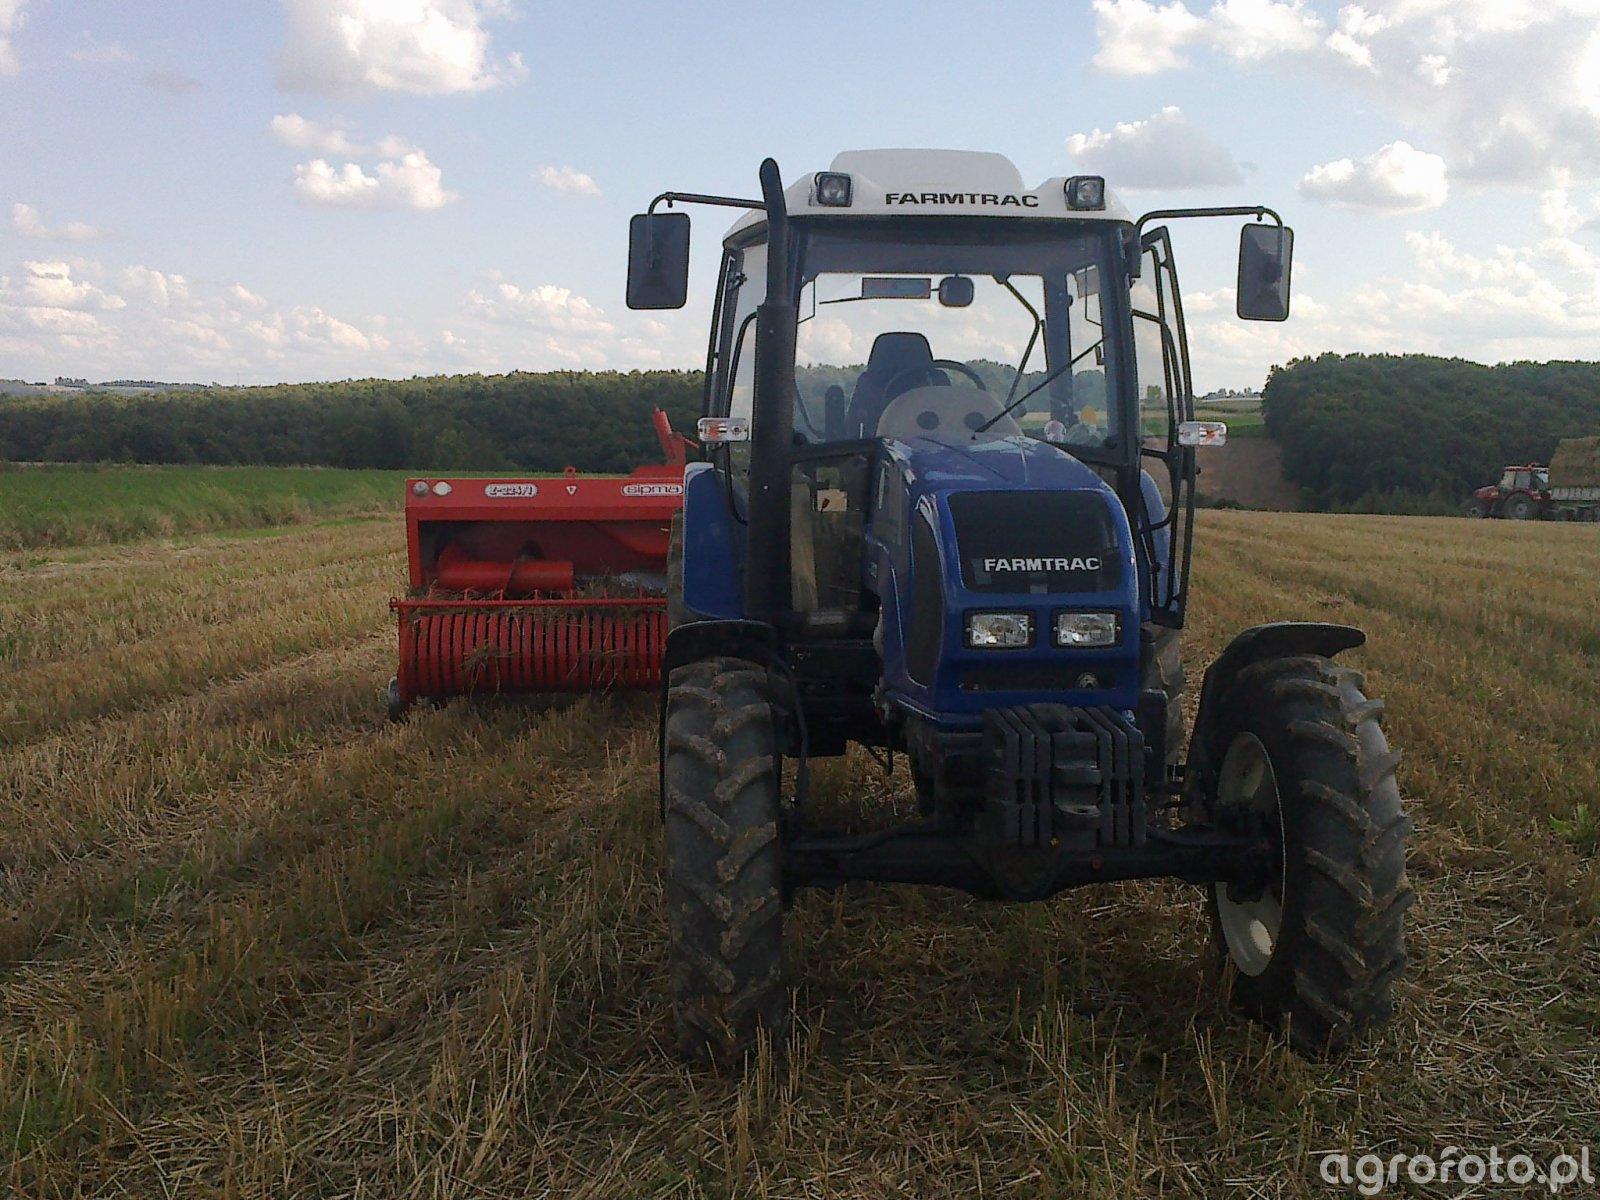 Farmtrac 675 DT + Sipma